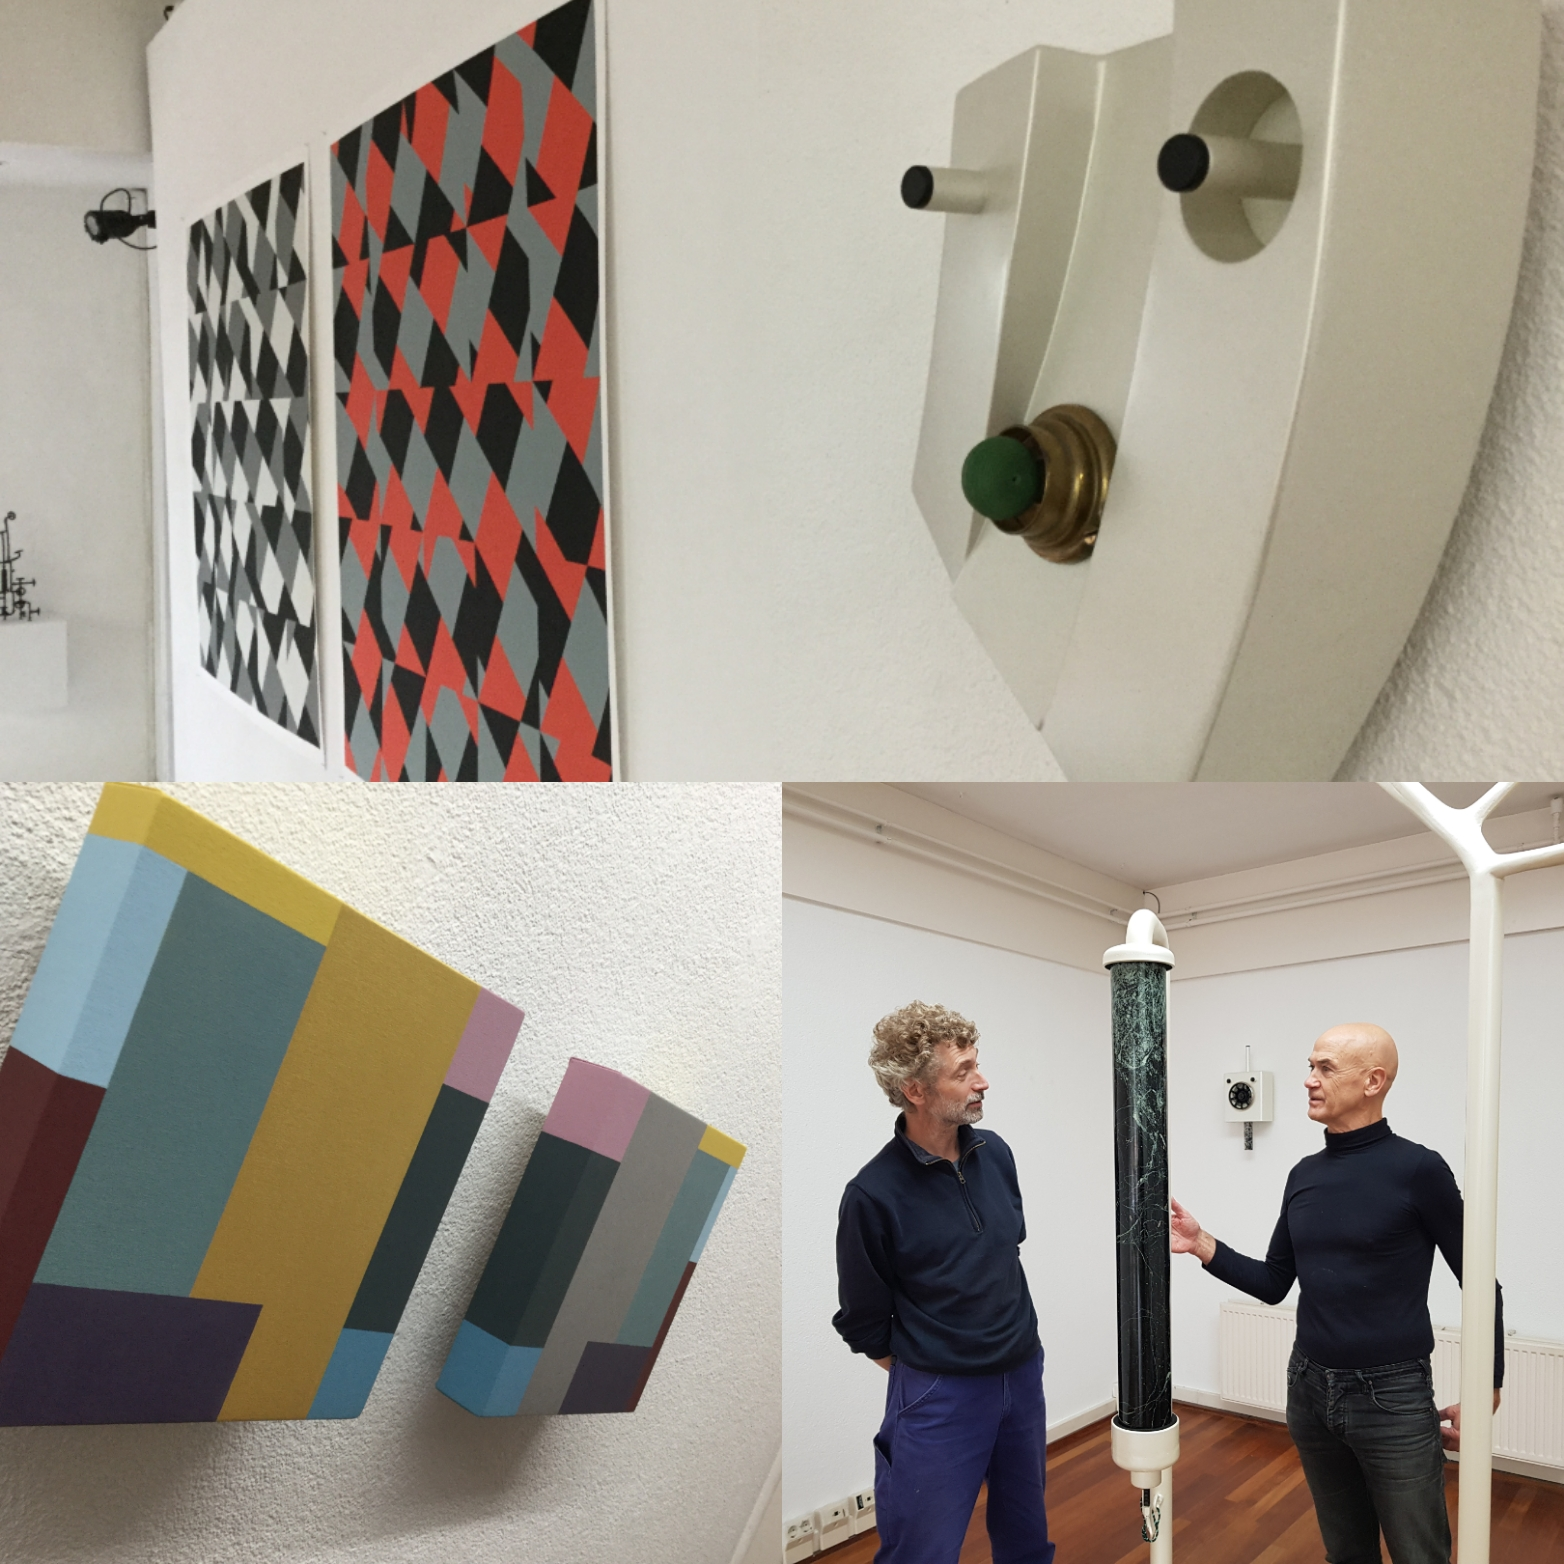 Tentoonstelling OVER EN WEER - Kunstadvies Hanneke Janssen